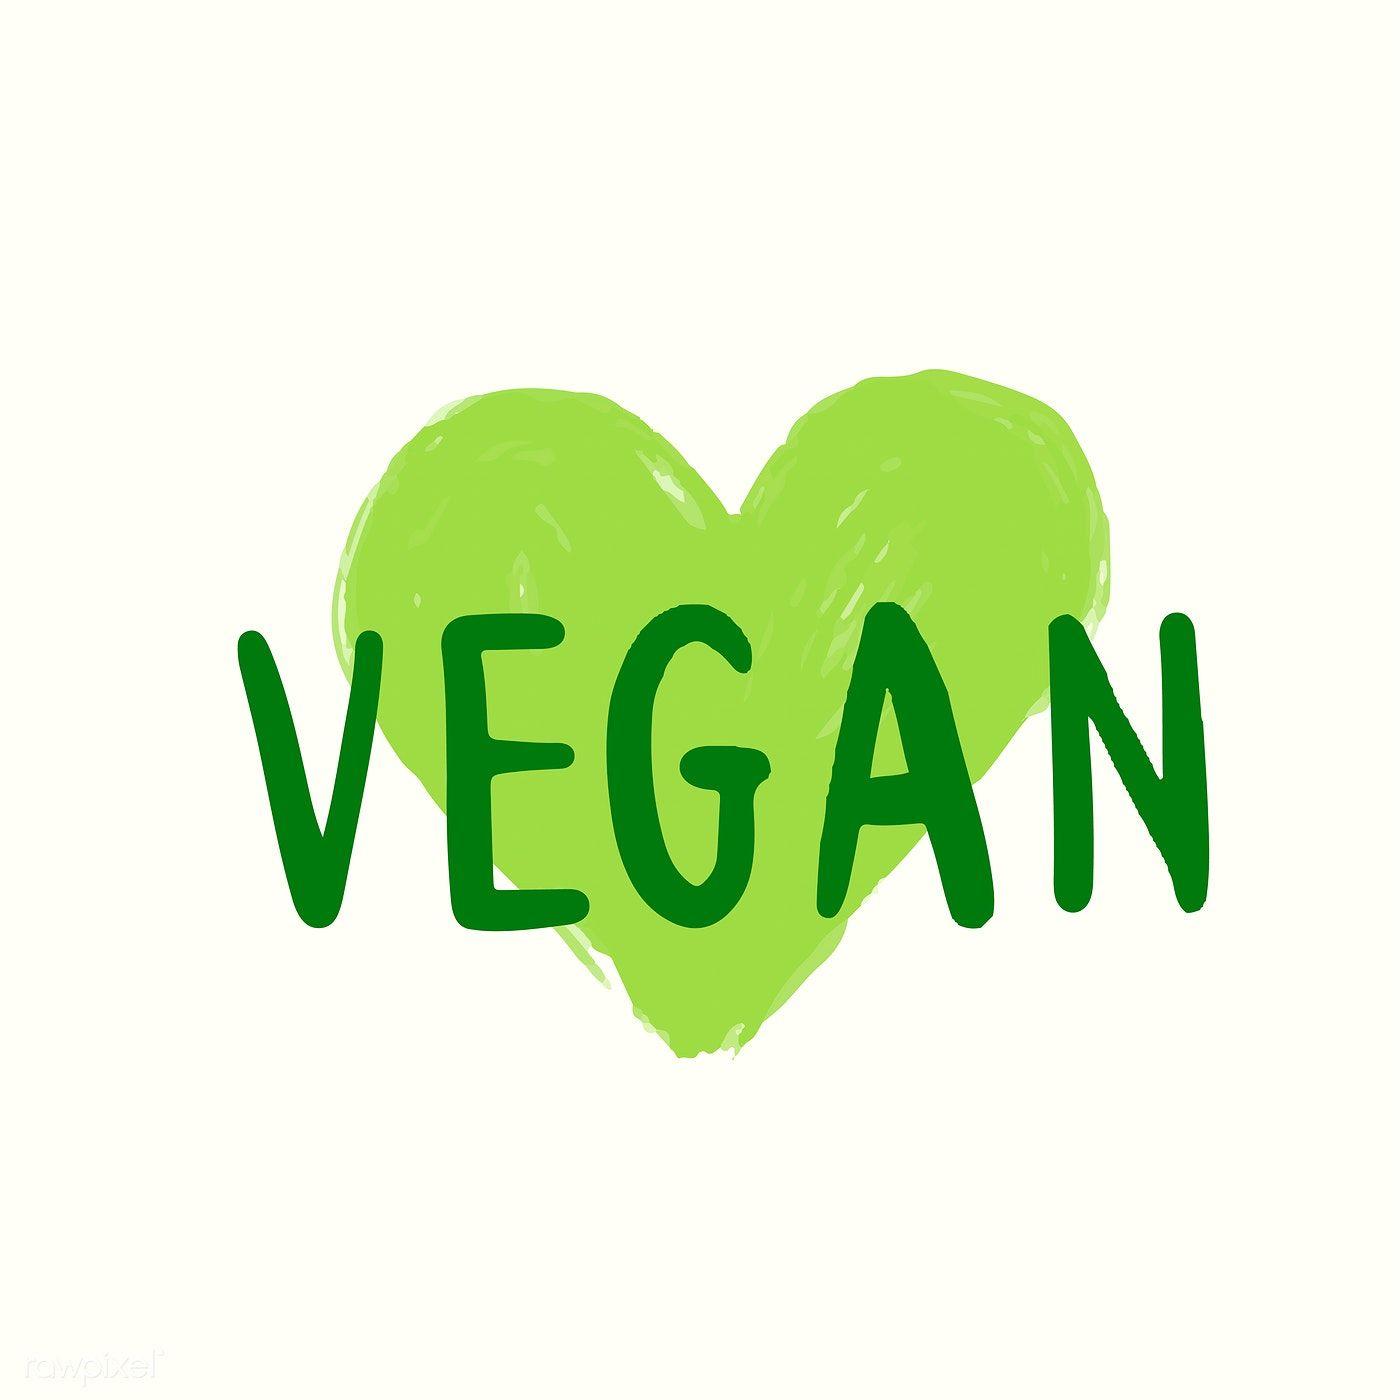 Vegan typography vector in green free image by rawpixel